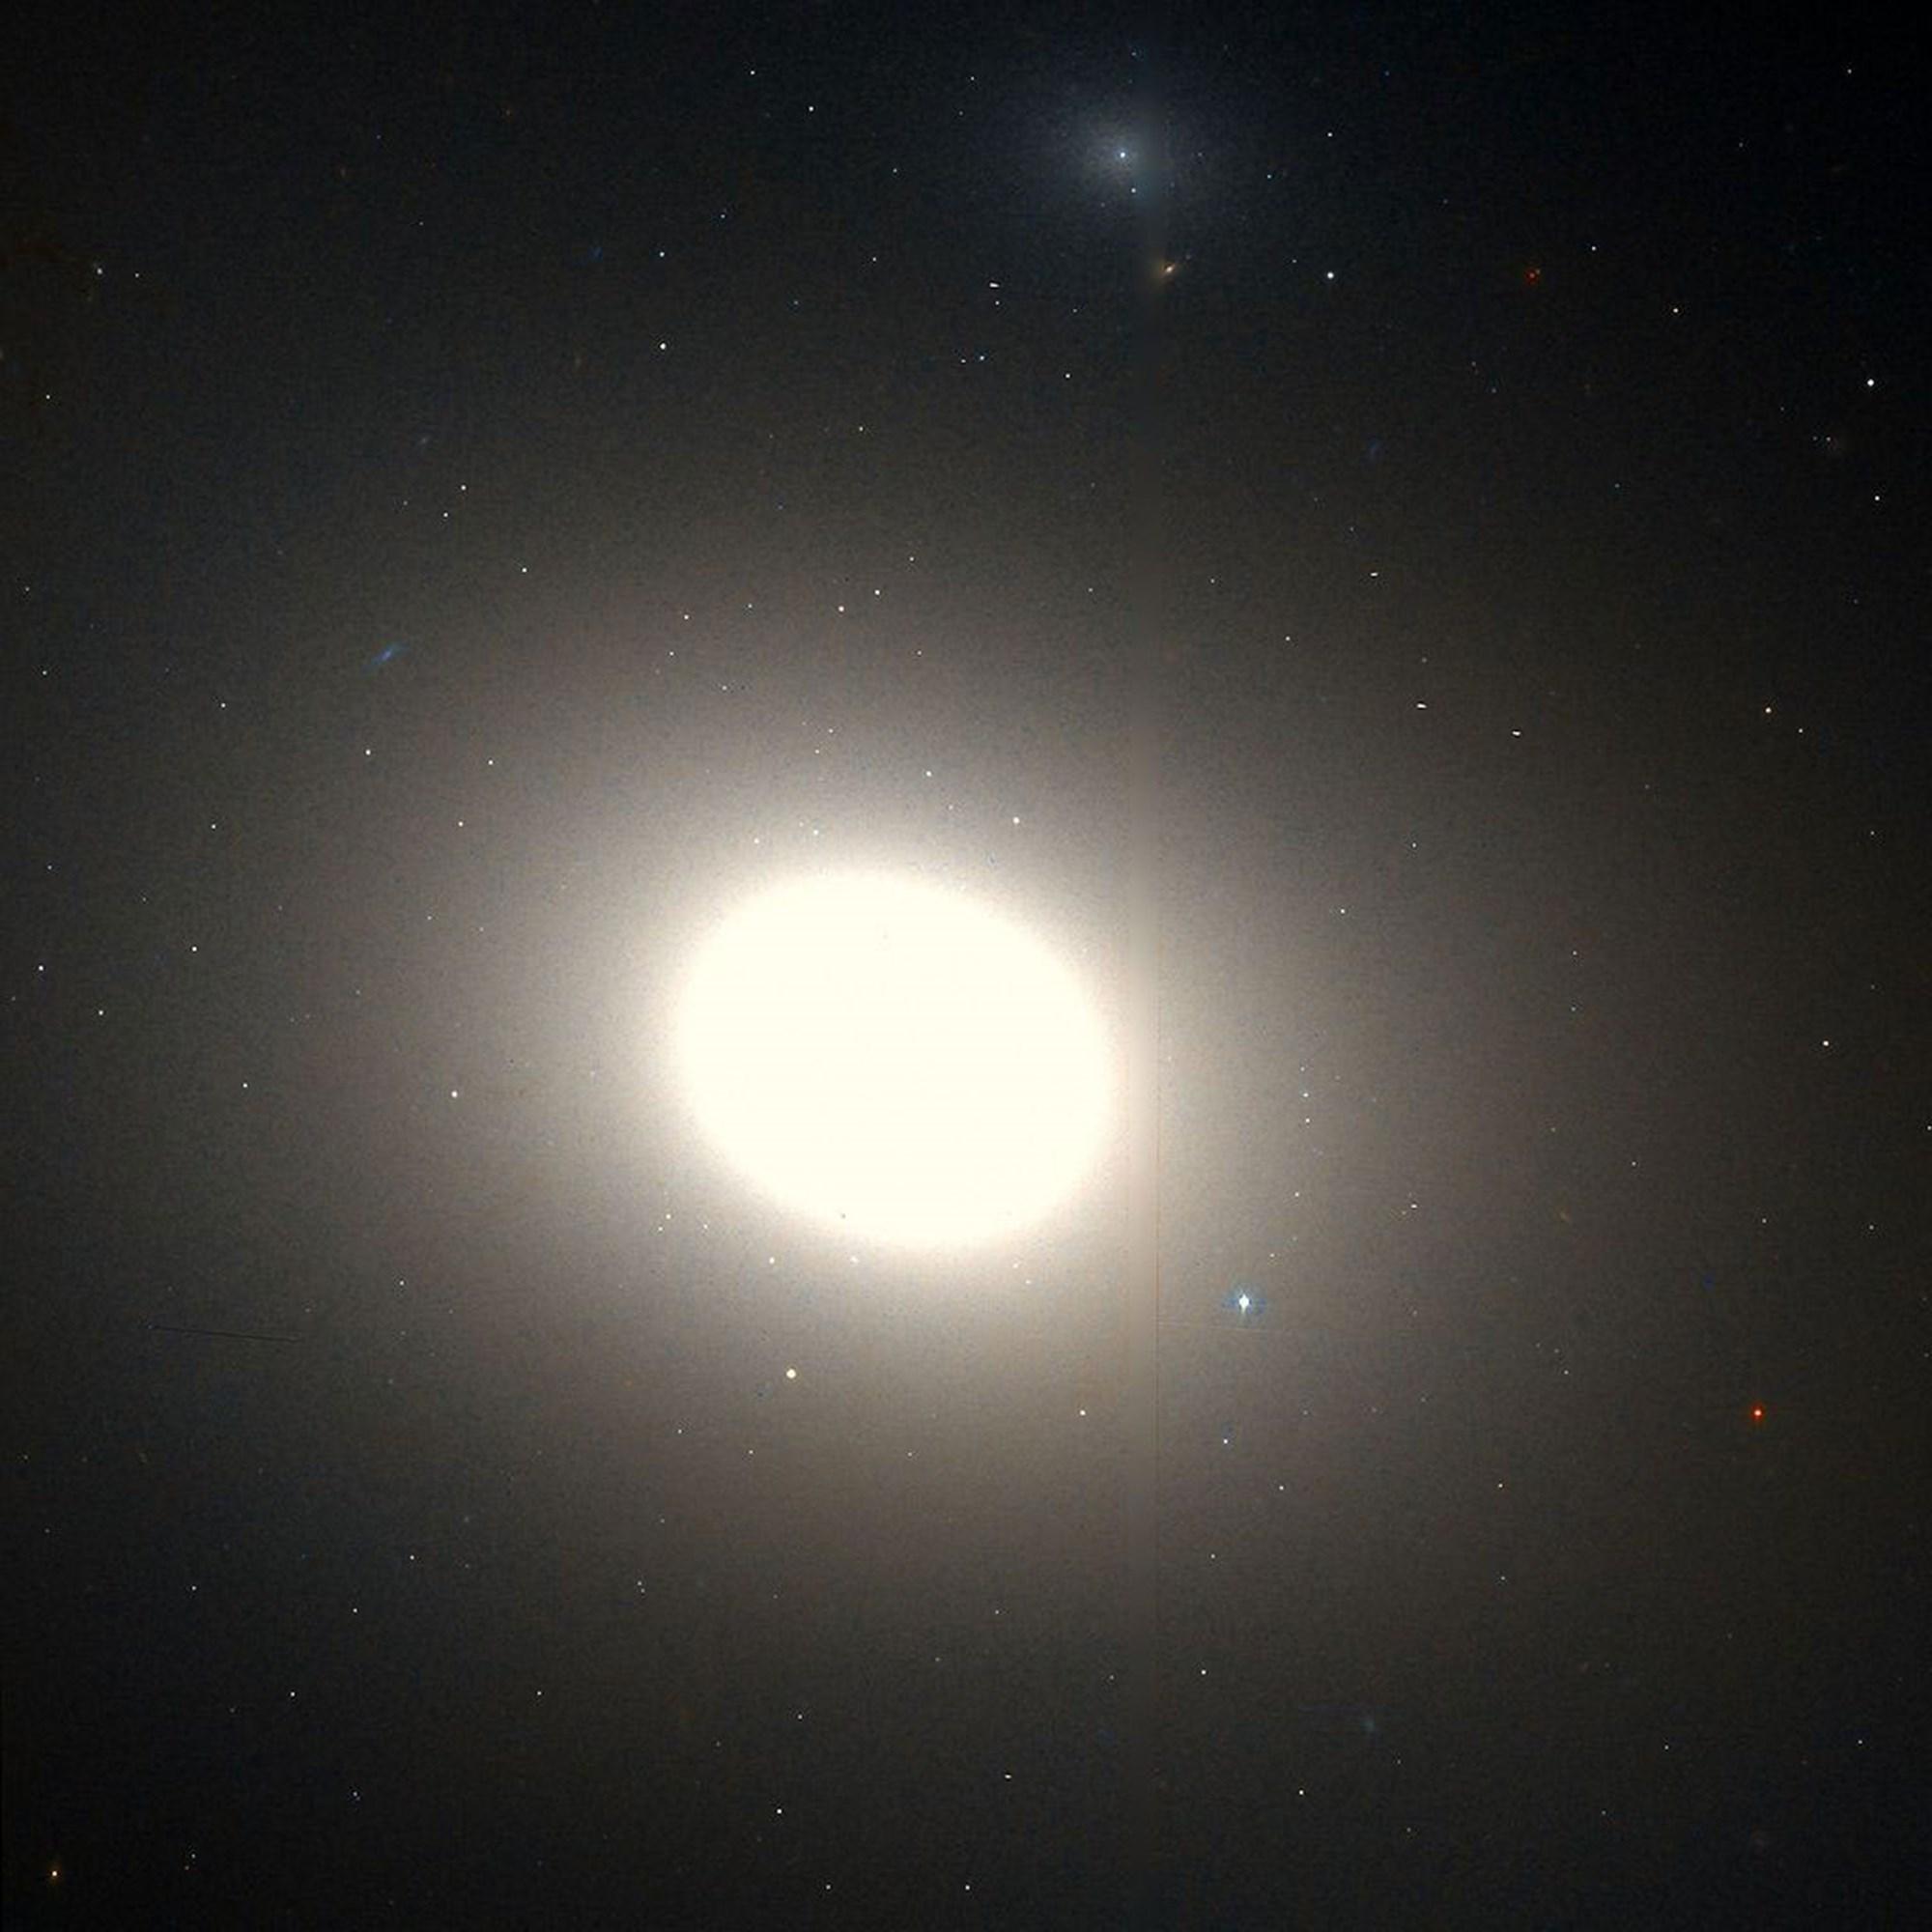 Rätselhafte ultrahelle Röntgenquelle im Nachbar-Galaxienhaufen entdeckt